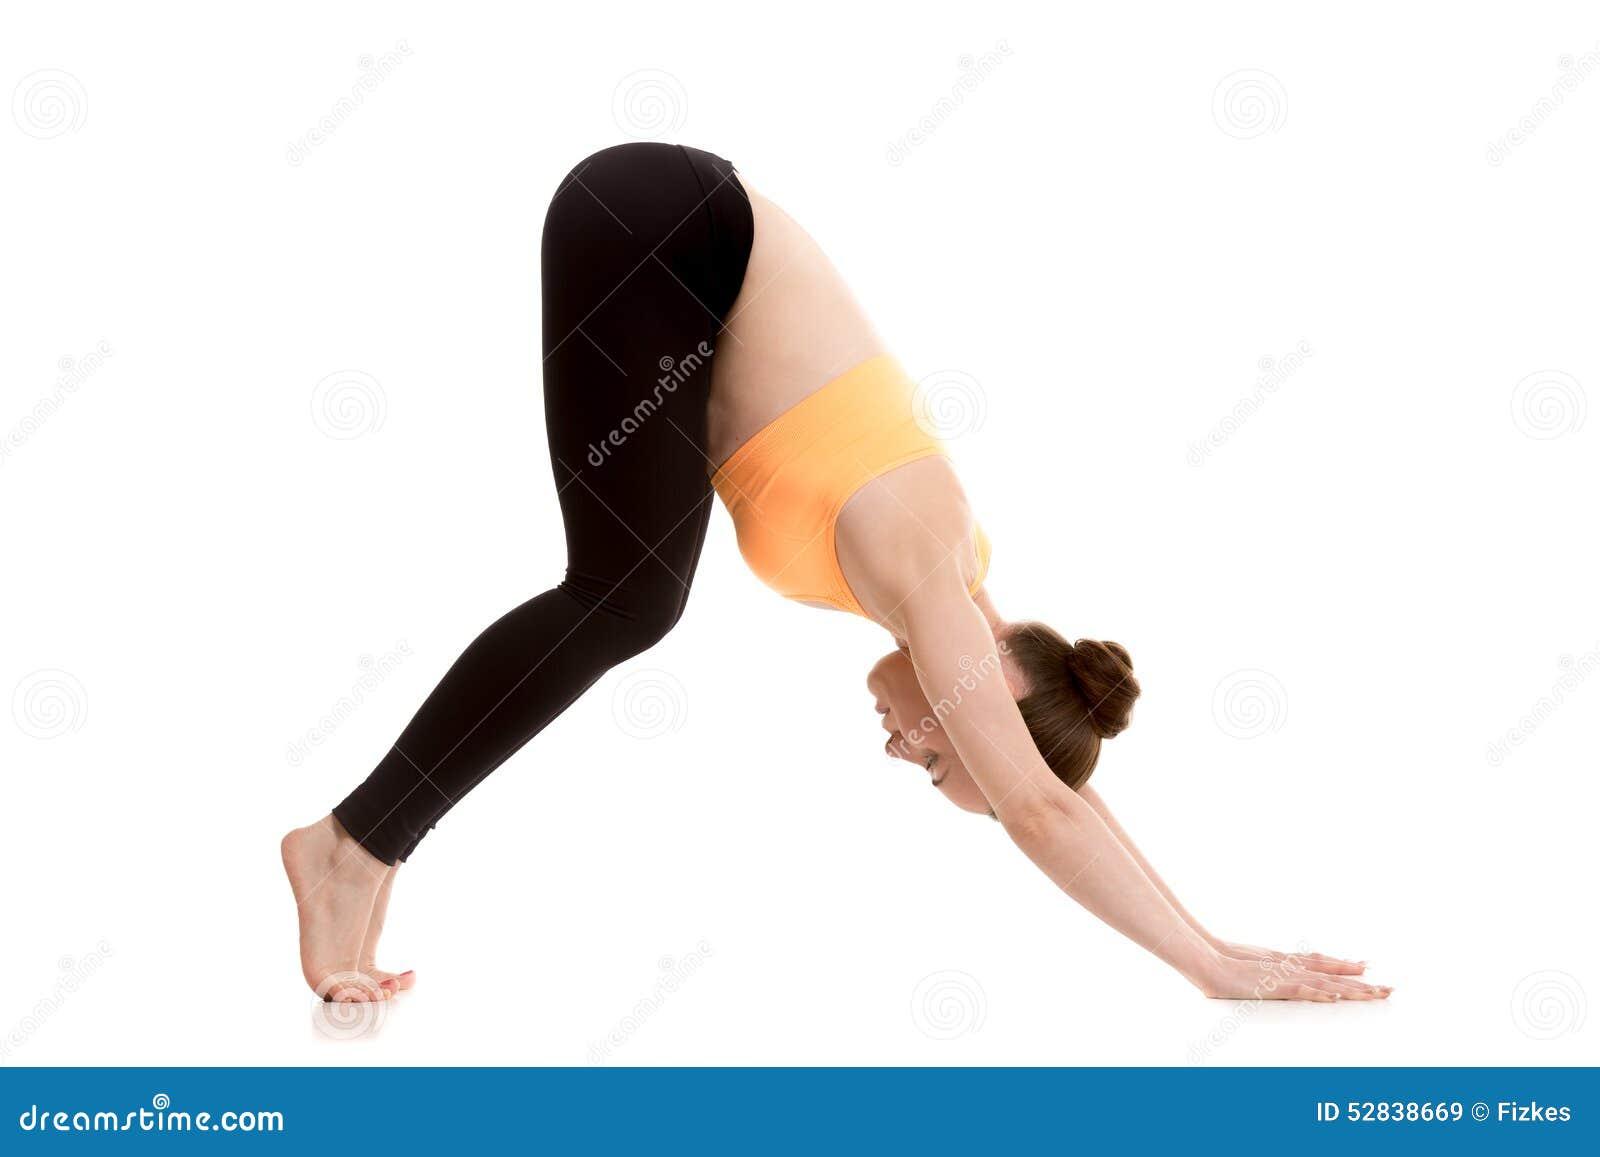 Downward Facing Dog Yoga Pose For Beginner Stock Image